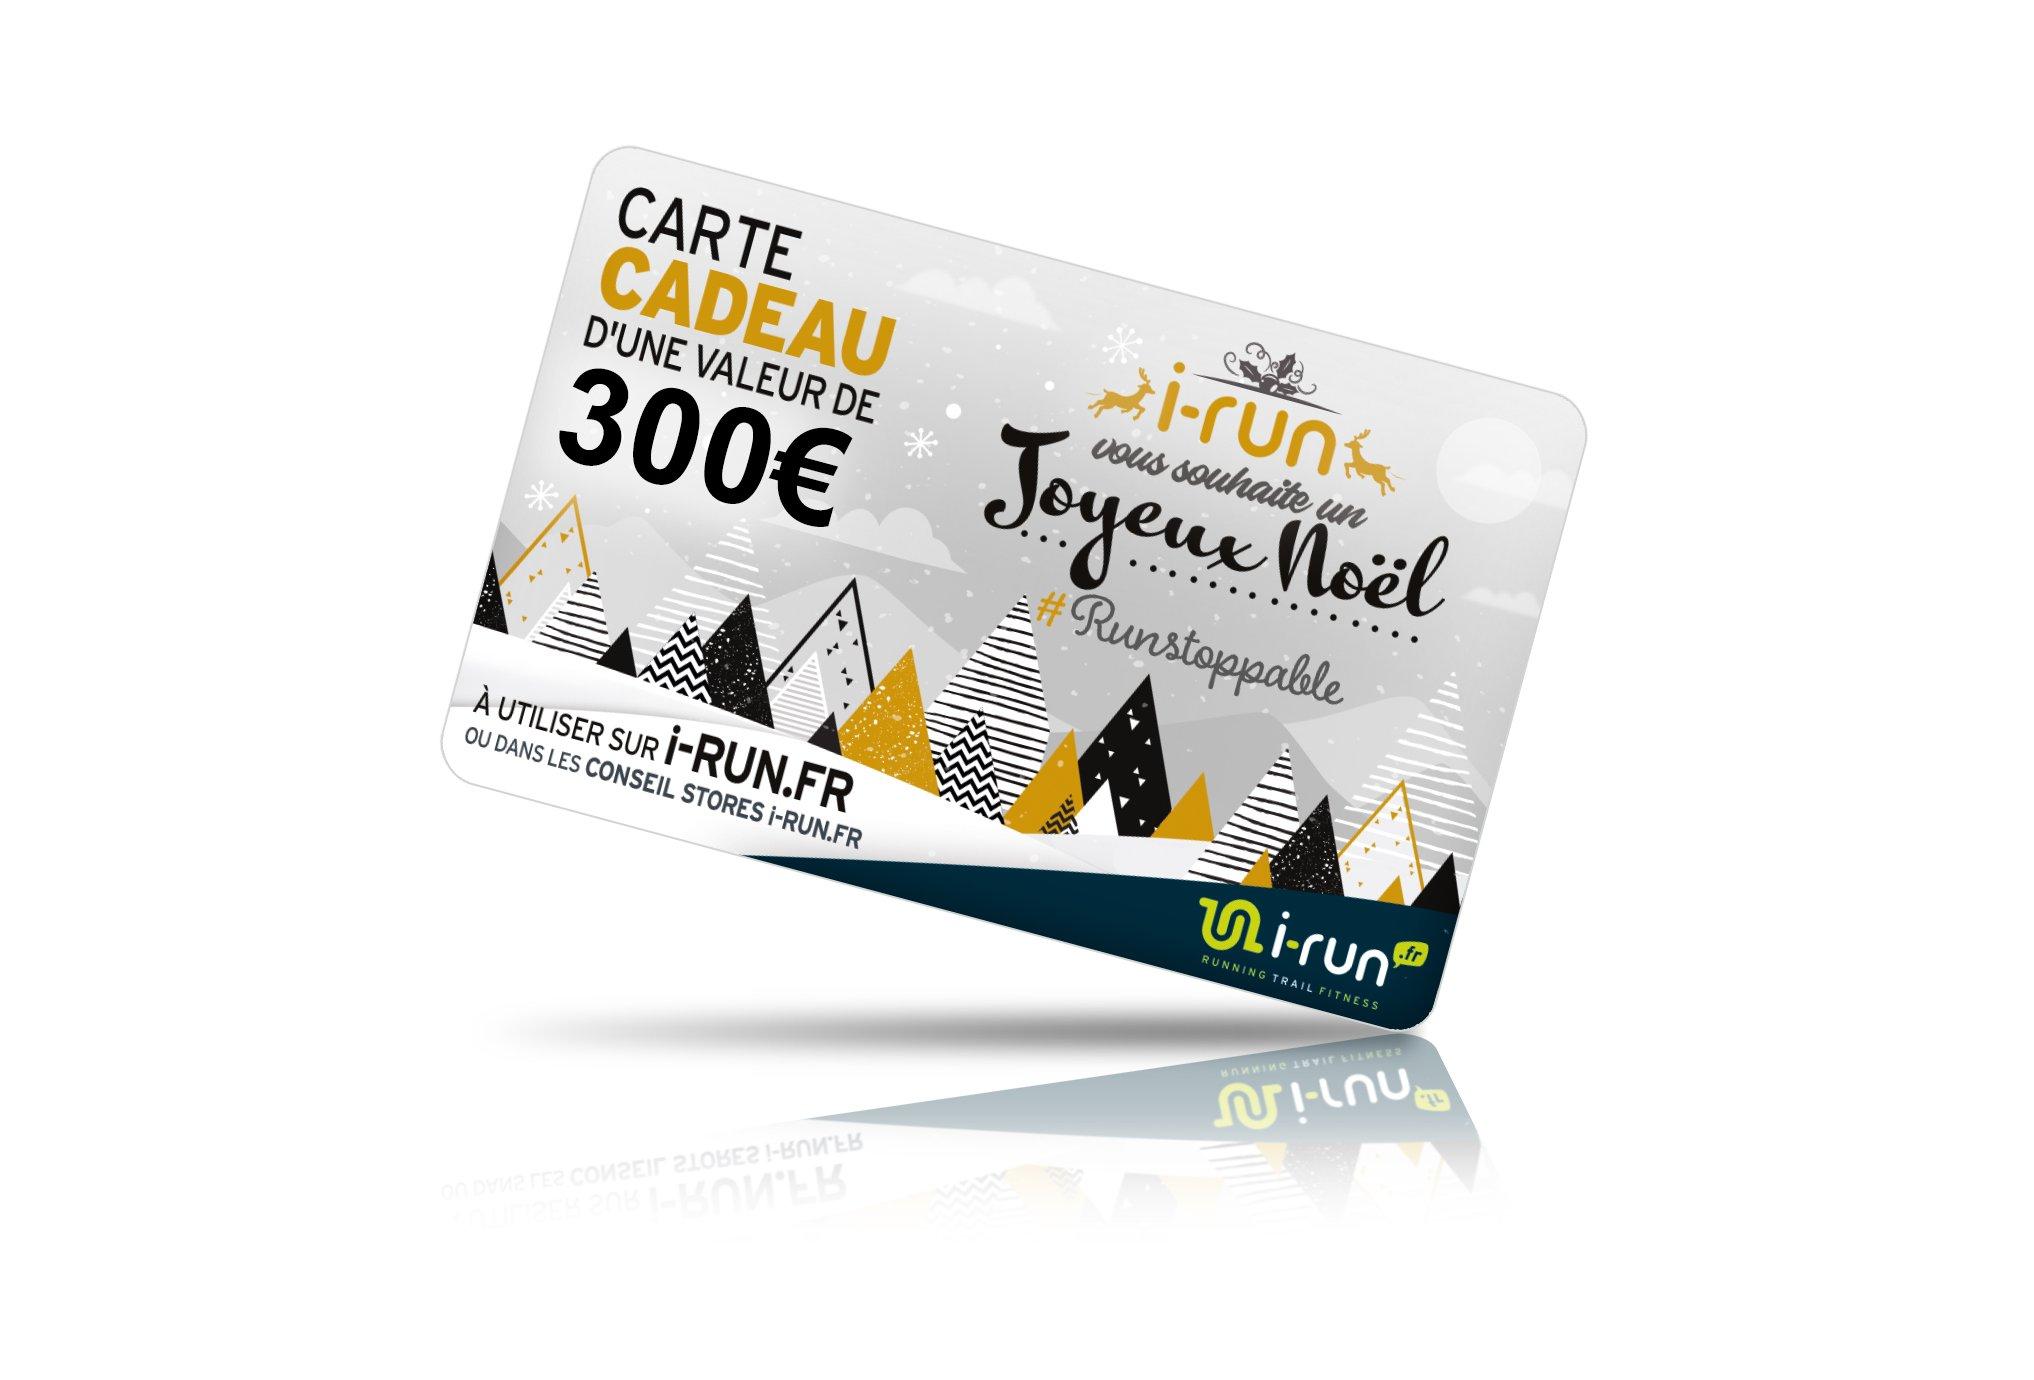 I-Run.Fr Carte cadeau 300 spéciale noël cartes cadeau